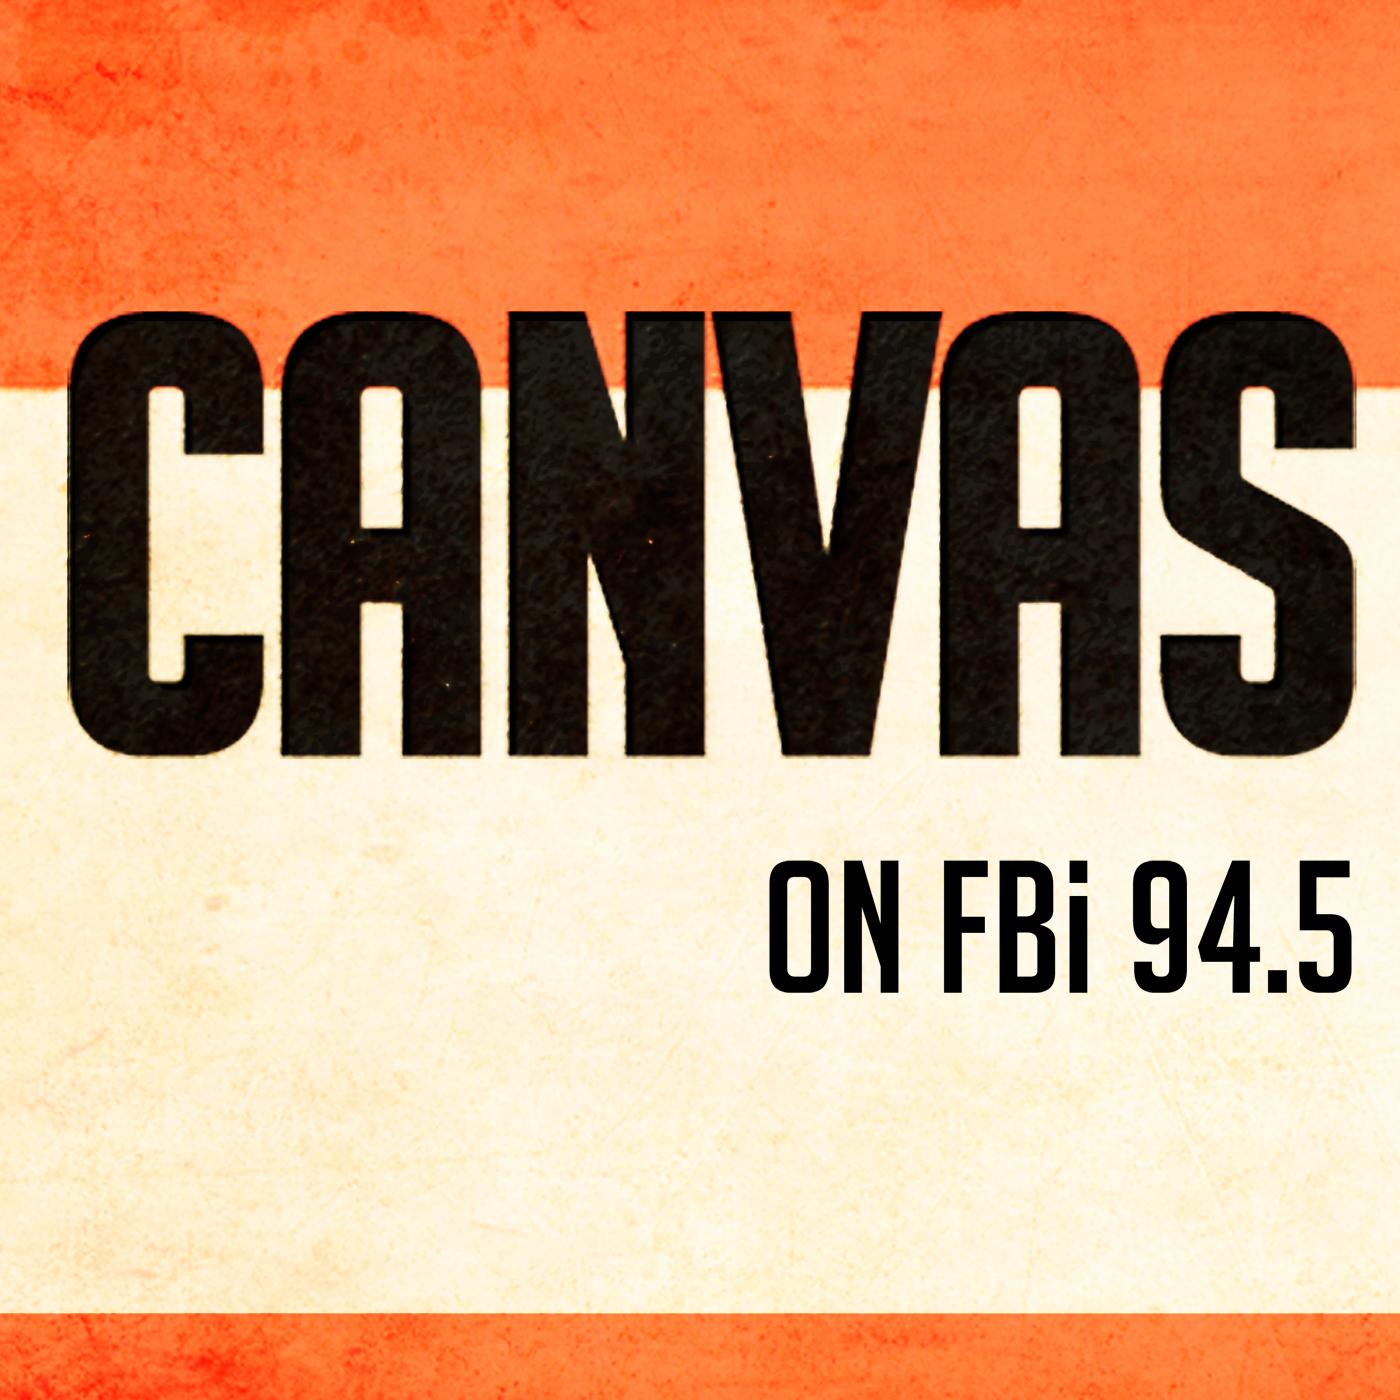 canvas profile.jpg